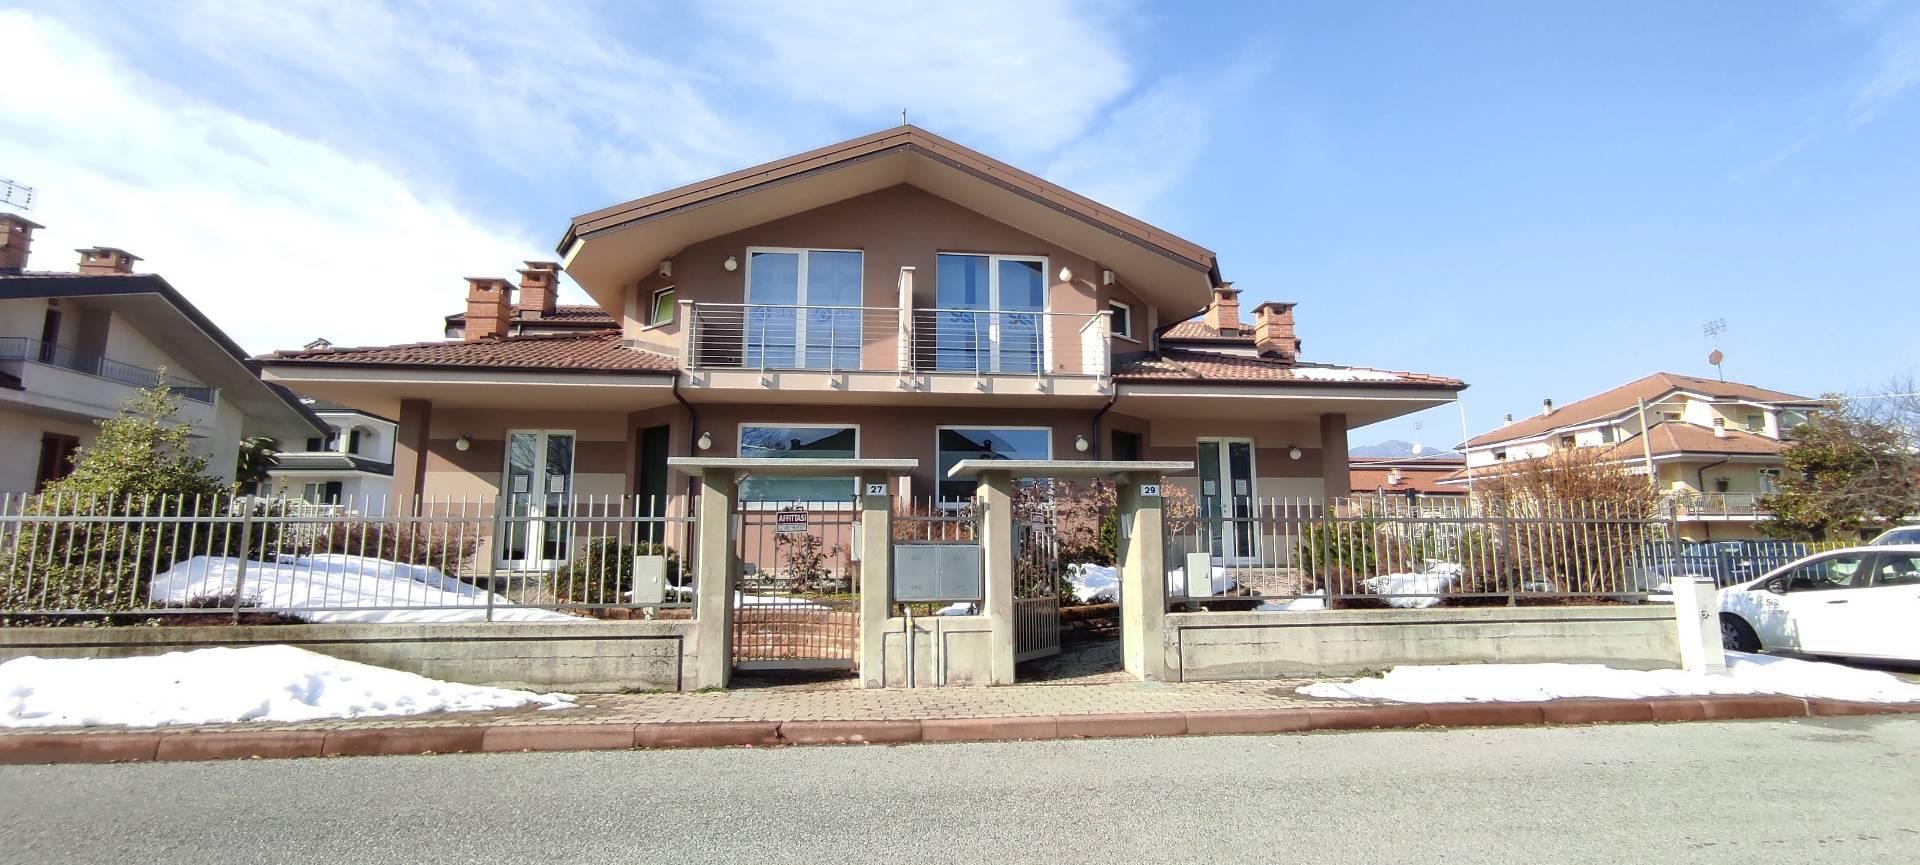 Villa in affitto a Cuneo (CN)